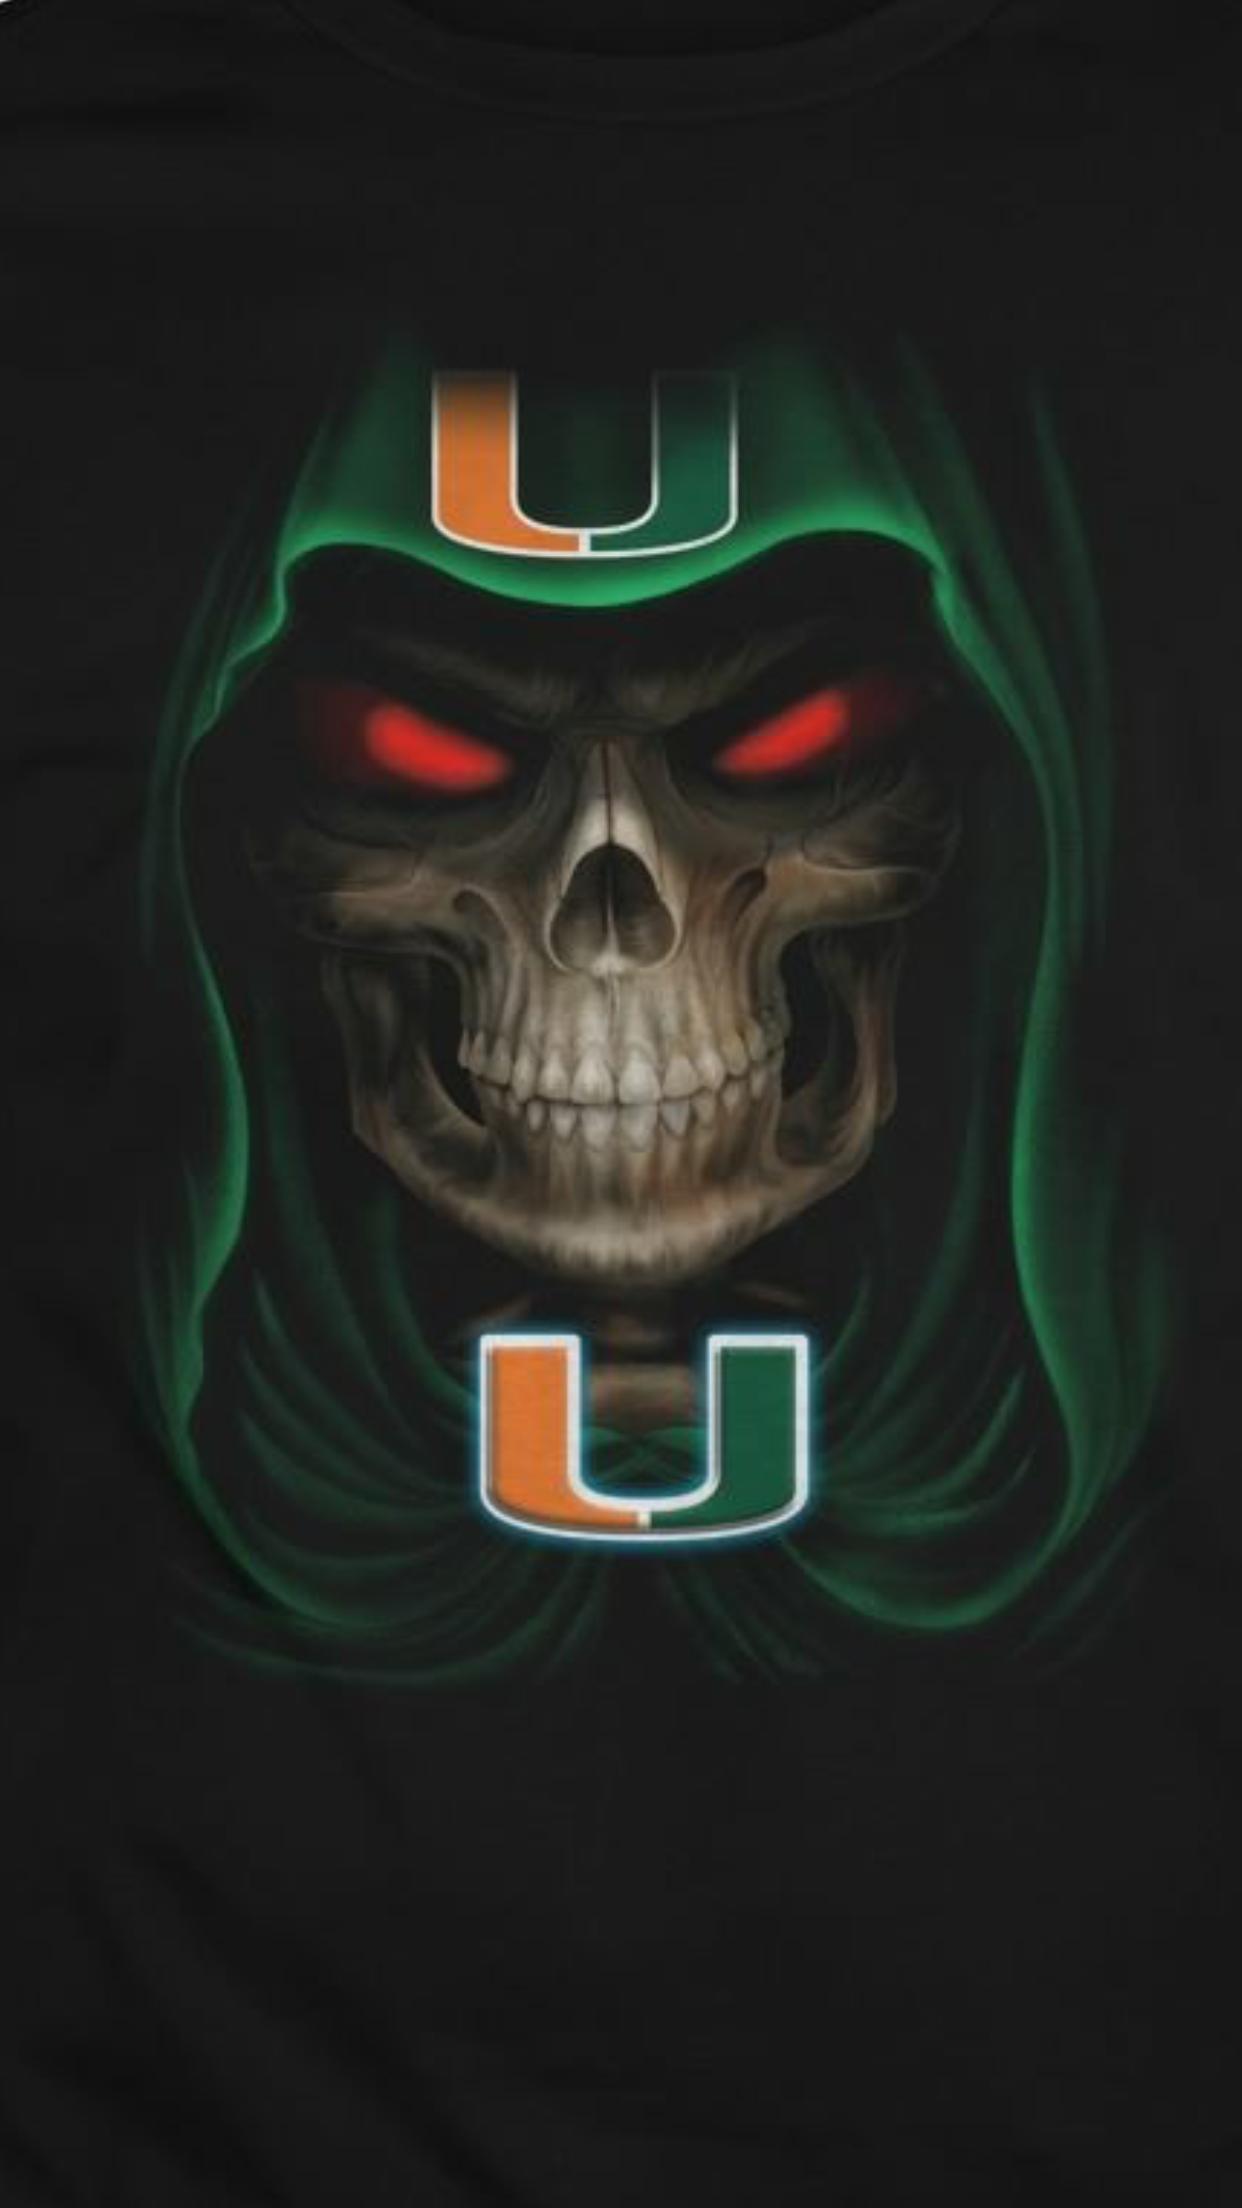 Skull Canes Miami Hurricanes Football Miami Football Hurricanes Football